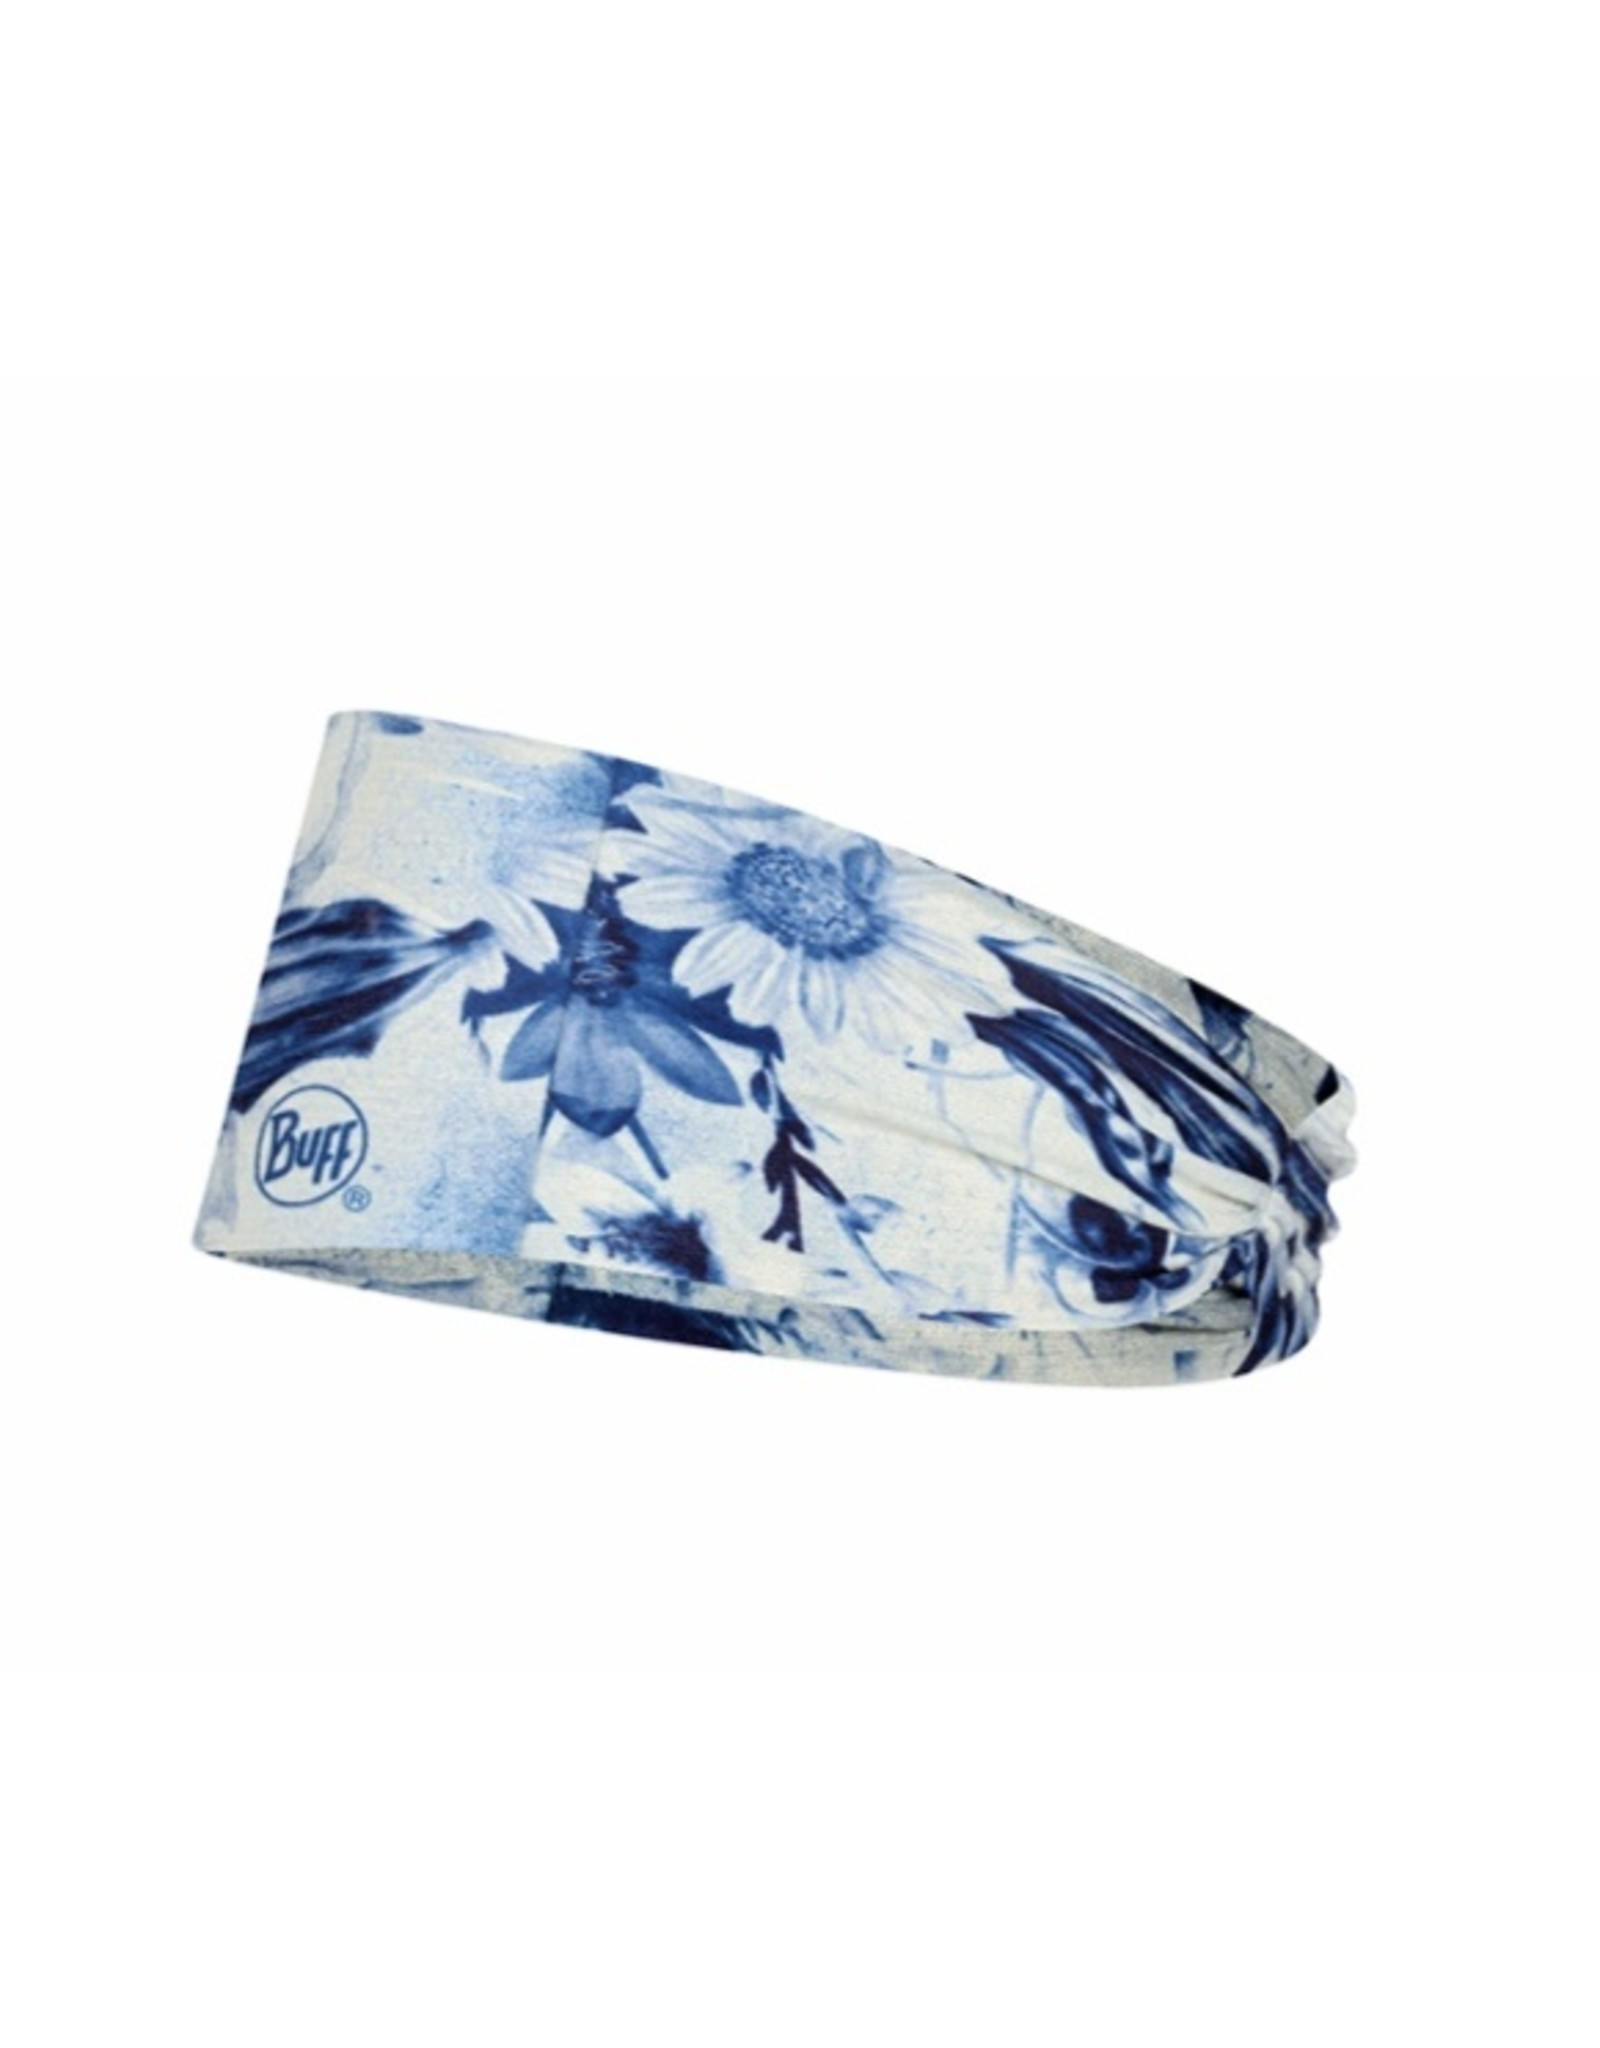 Buff Buff CoolNet UV+ Tapered Headband Delft Multi